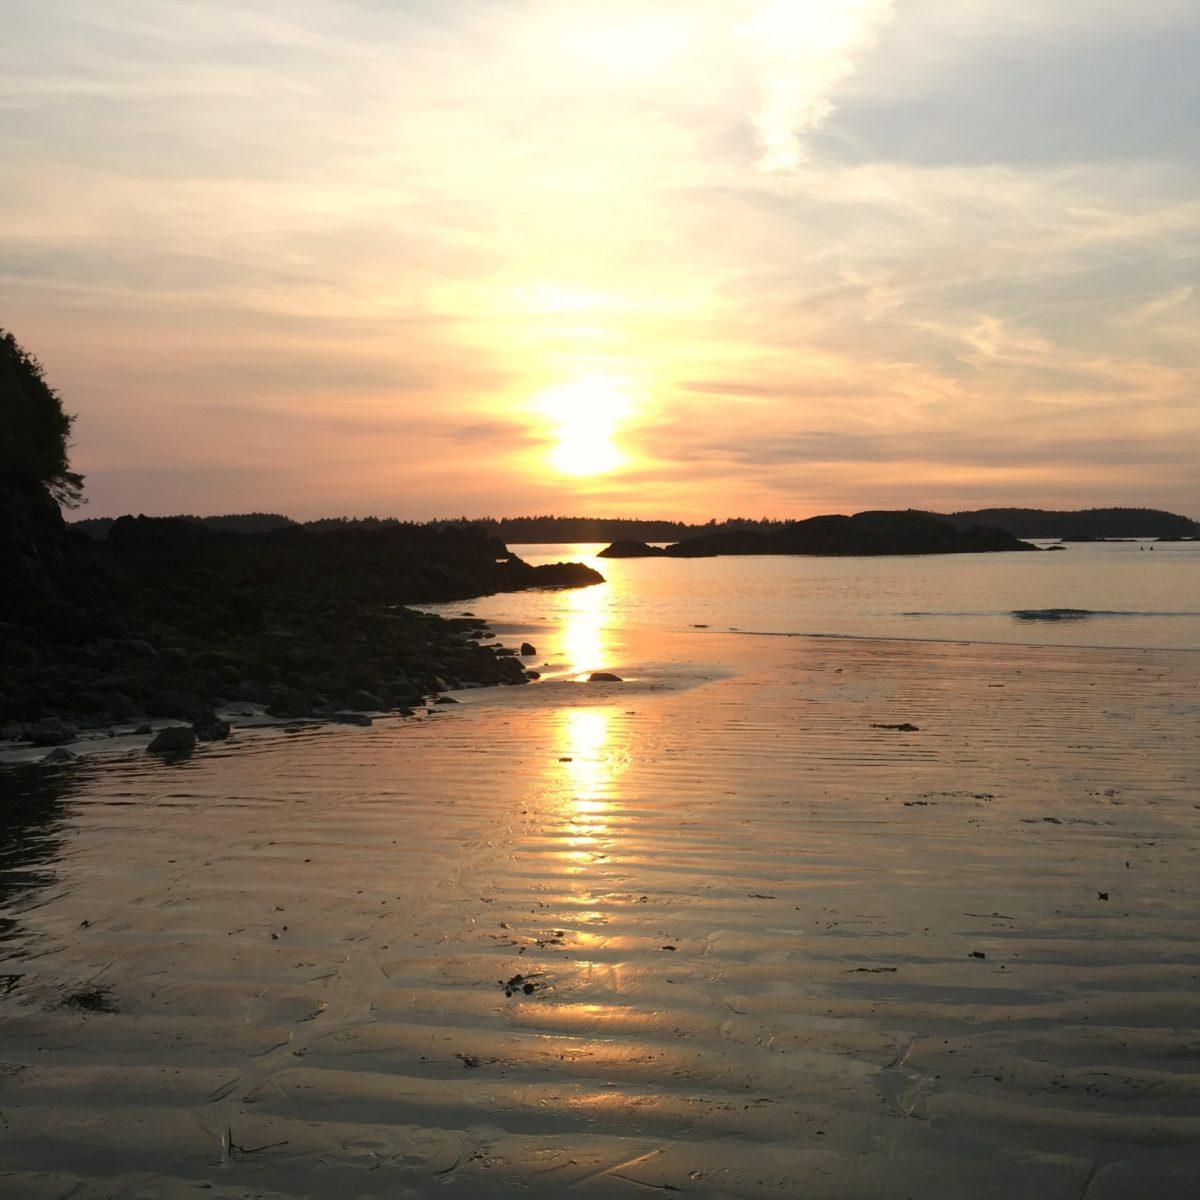 Tofino, beach, ocean, travel, beachfront, vancouver island, pet friendly, resort, sunset